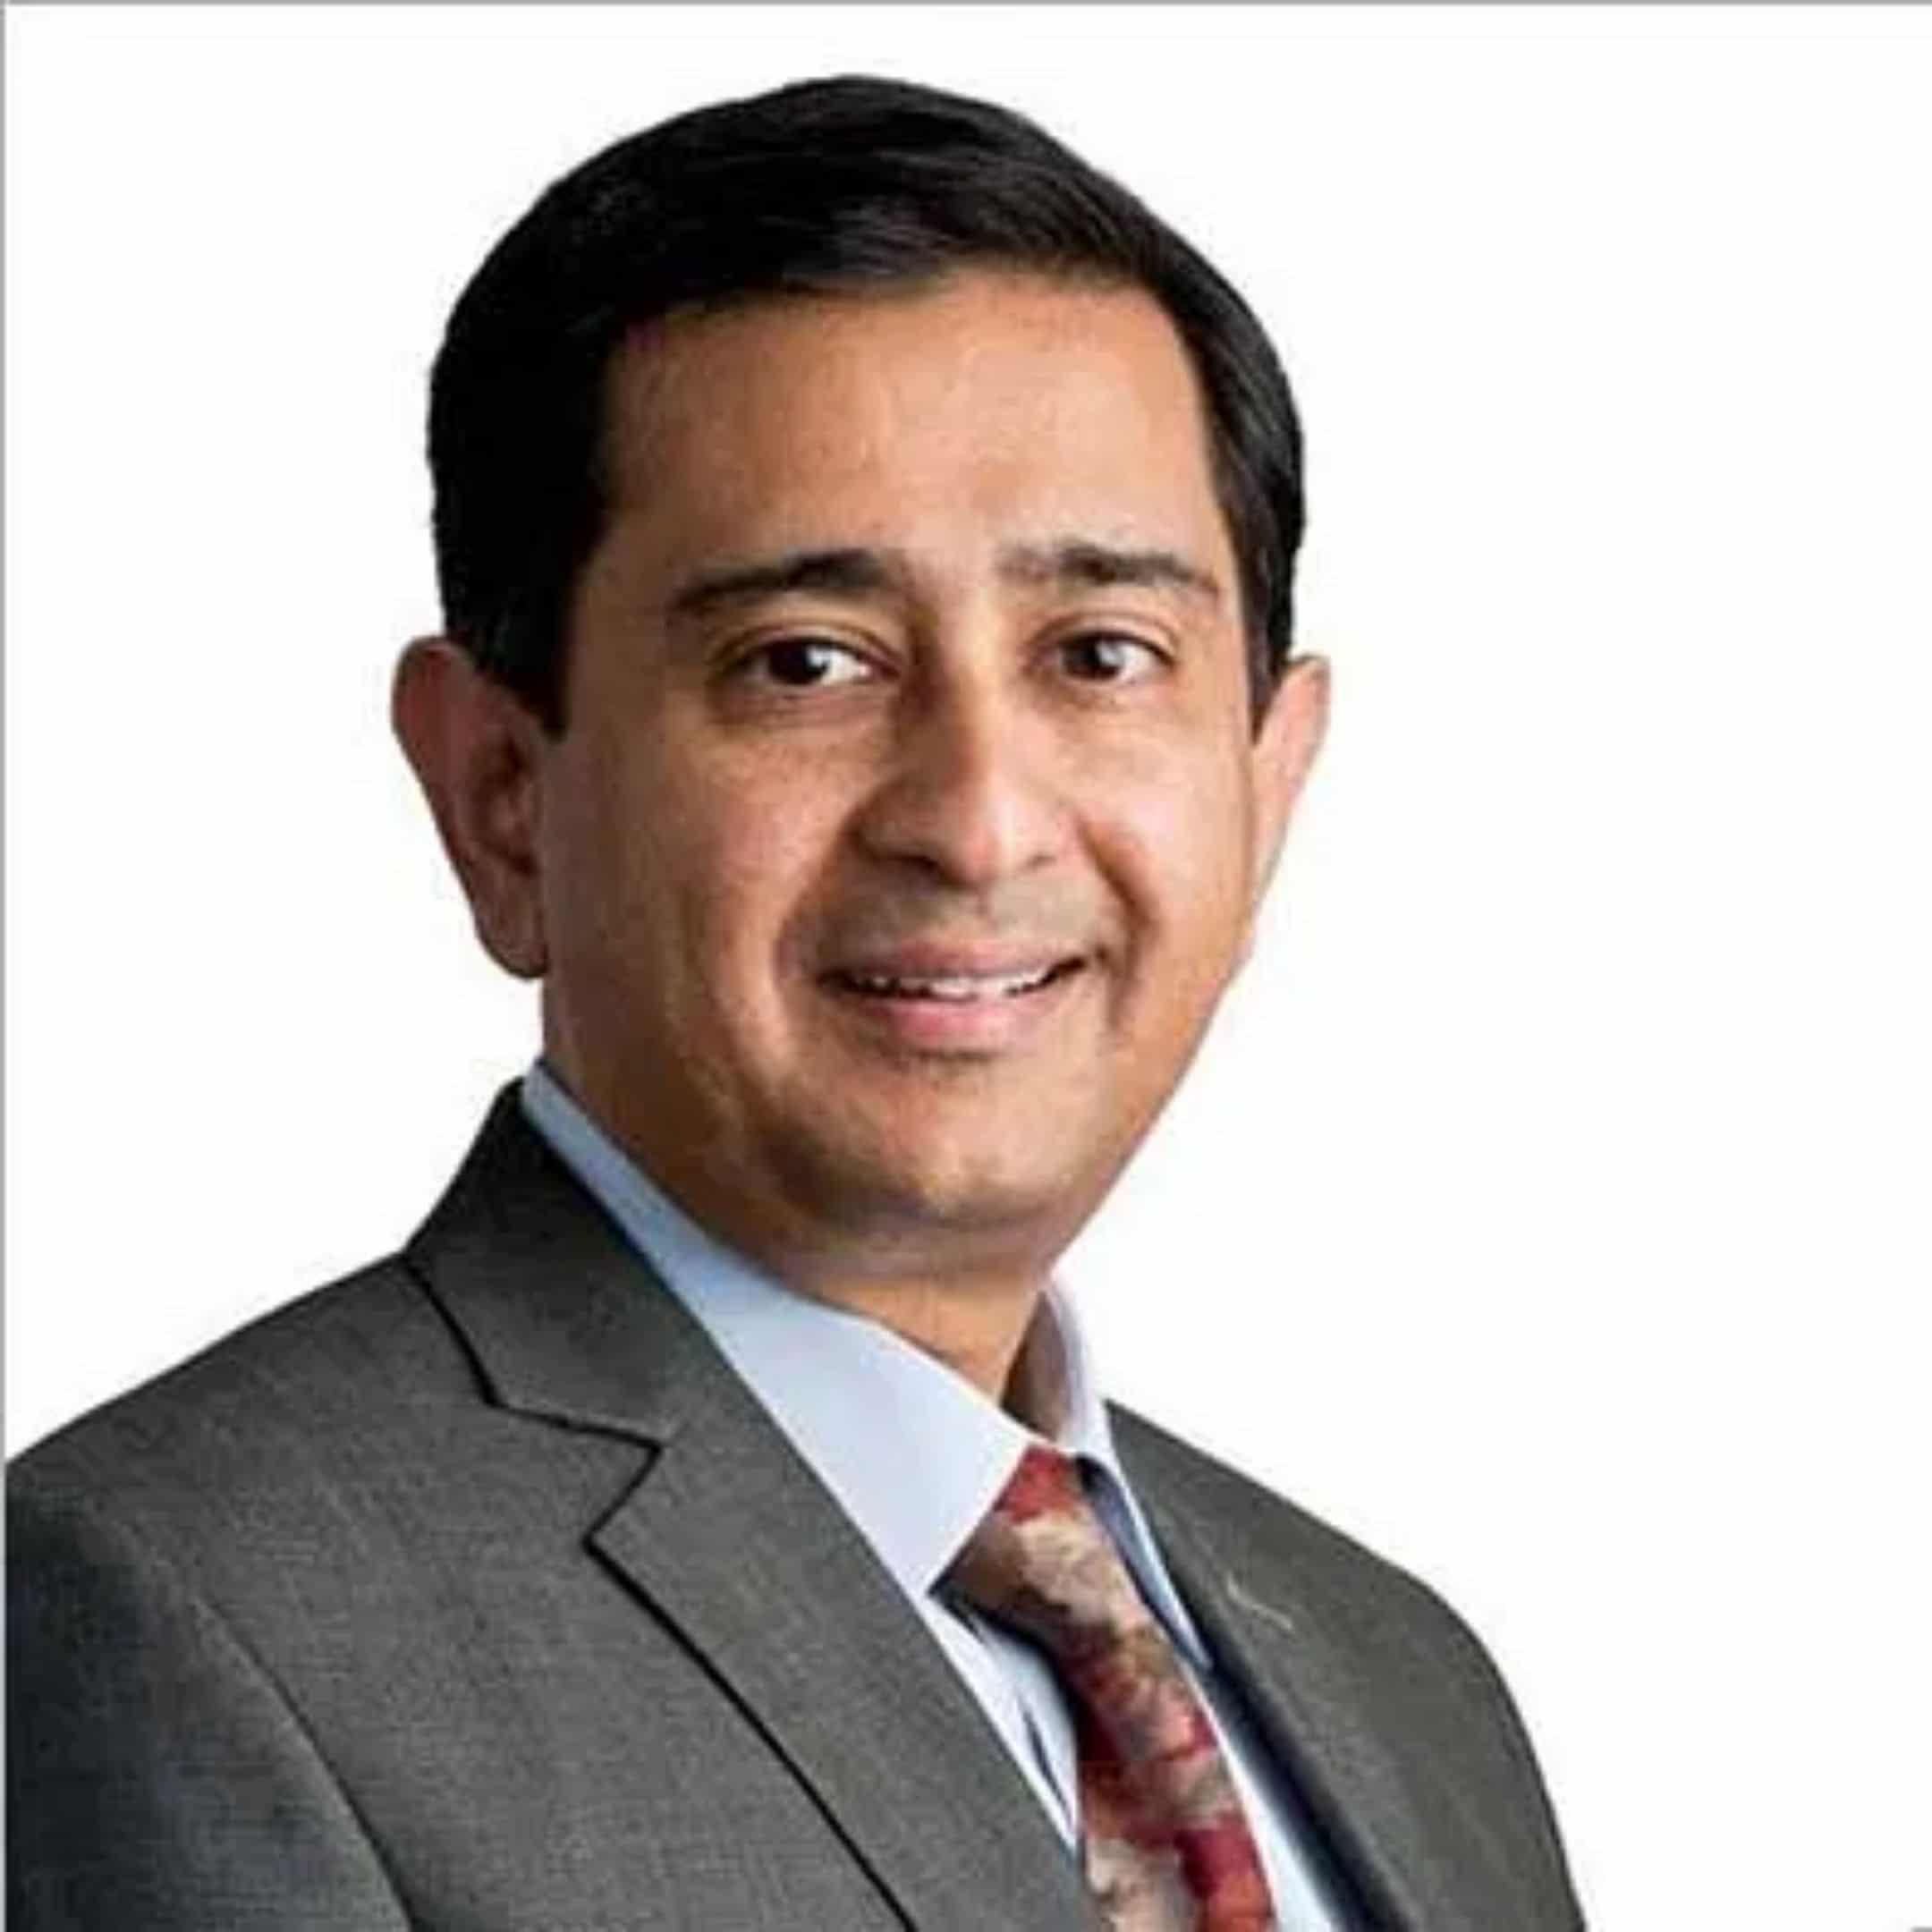 Image-Sumeet-Walia-Chief-Sales-Marketing-Officer-at-Tata-Communications-MediaBrief.jpg